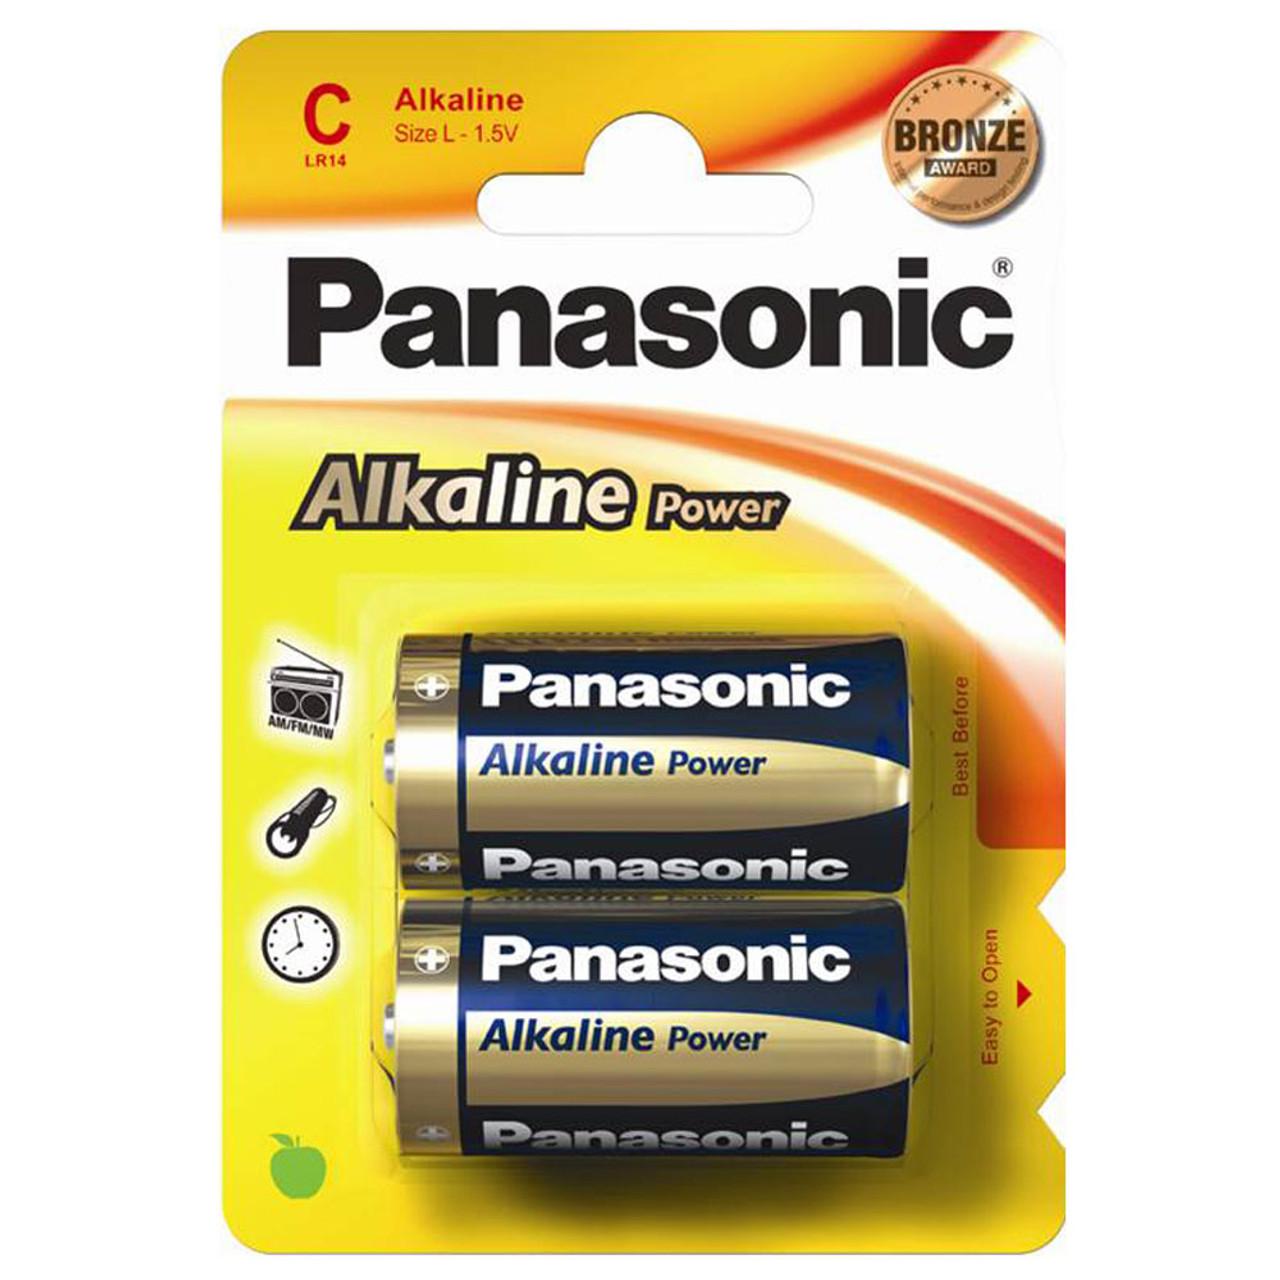 Panasonic Alkaline Power Bronze C Lr14 Batteries 2 Pack